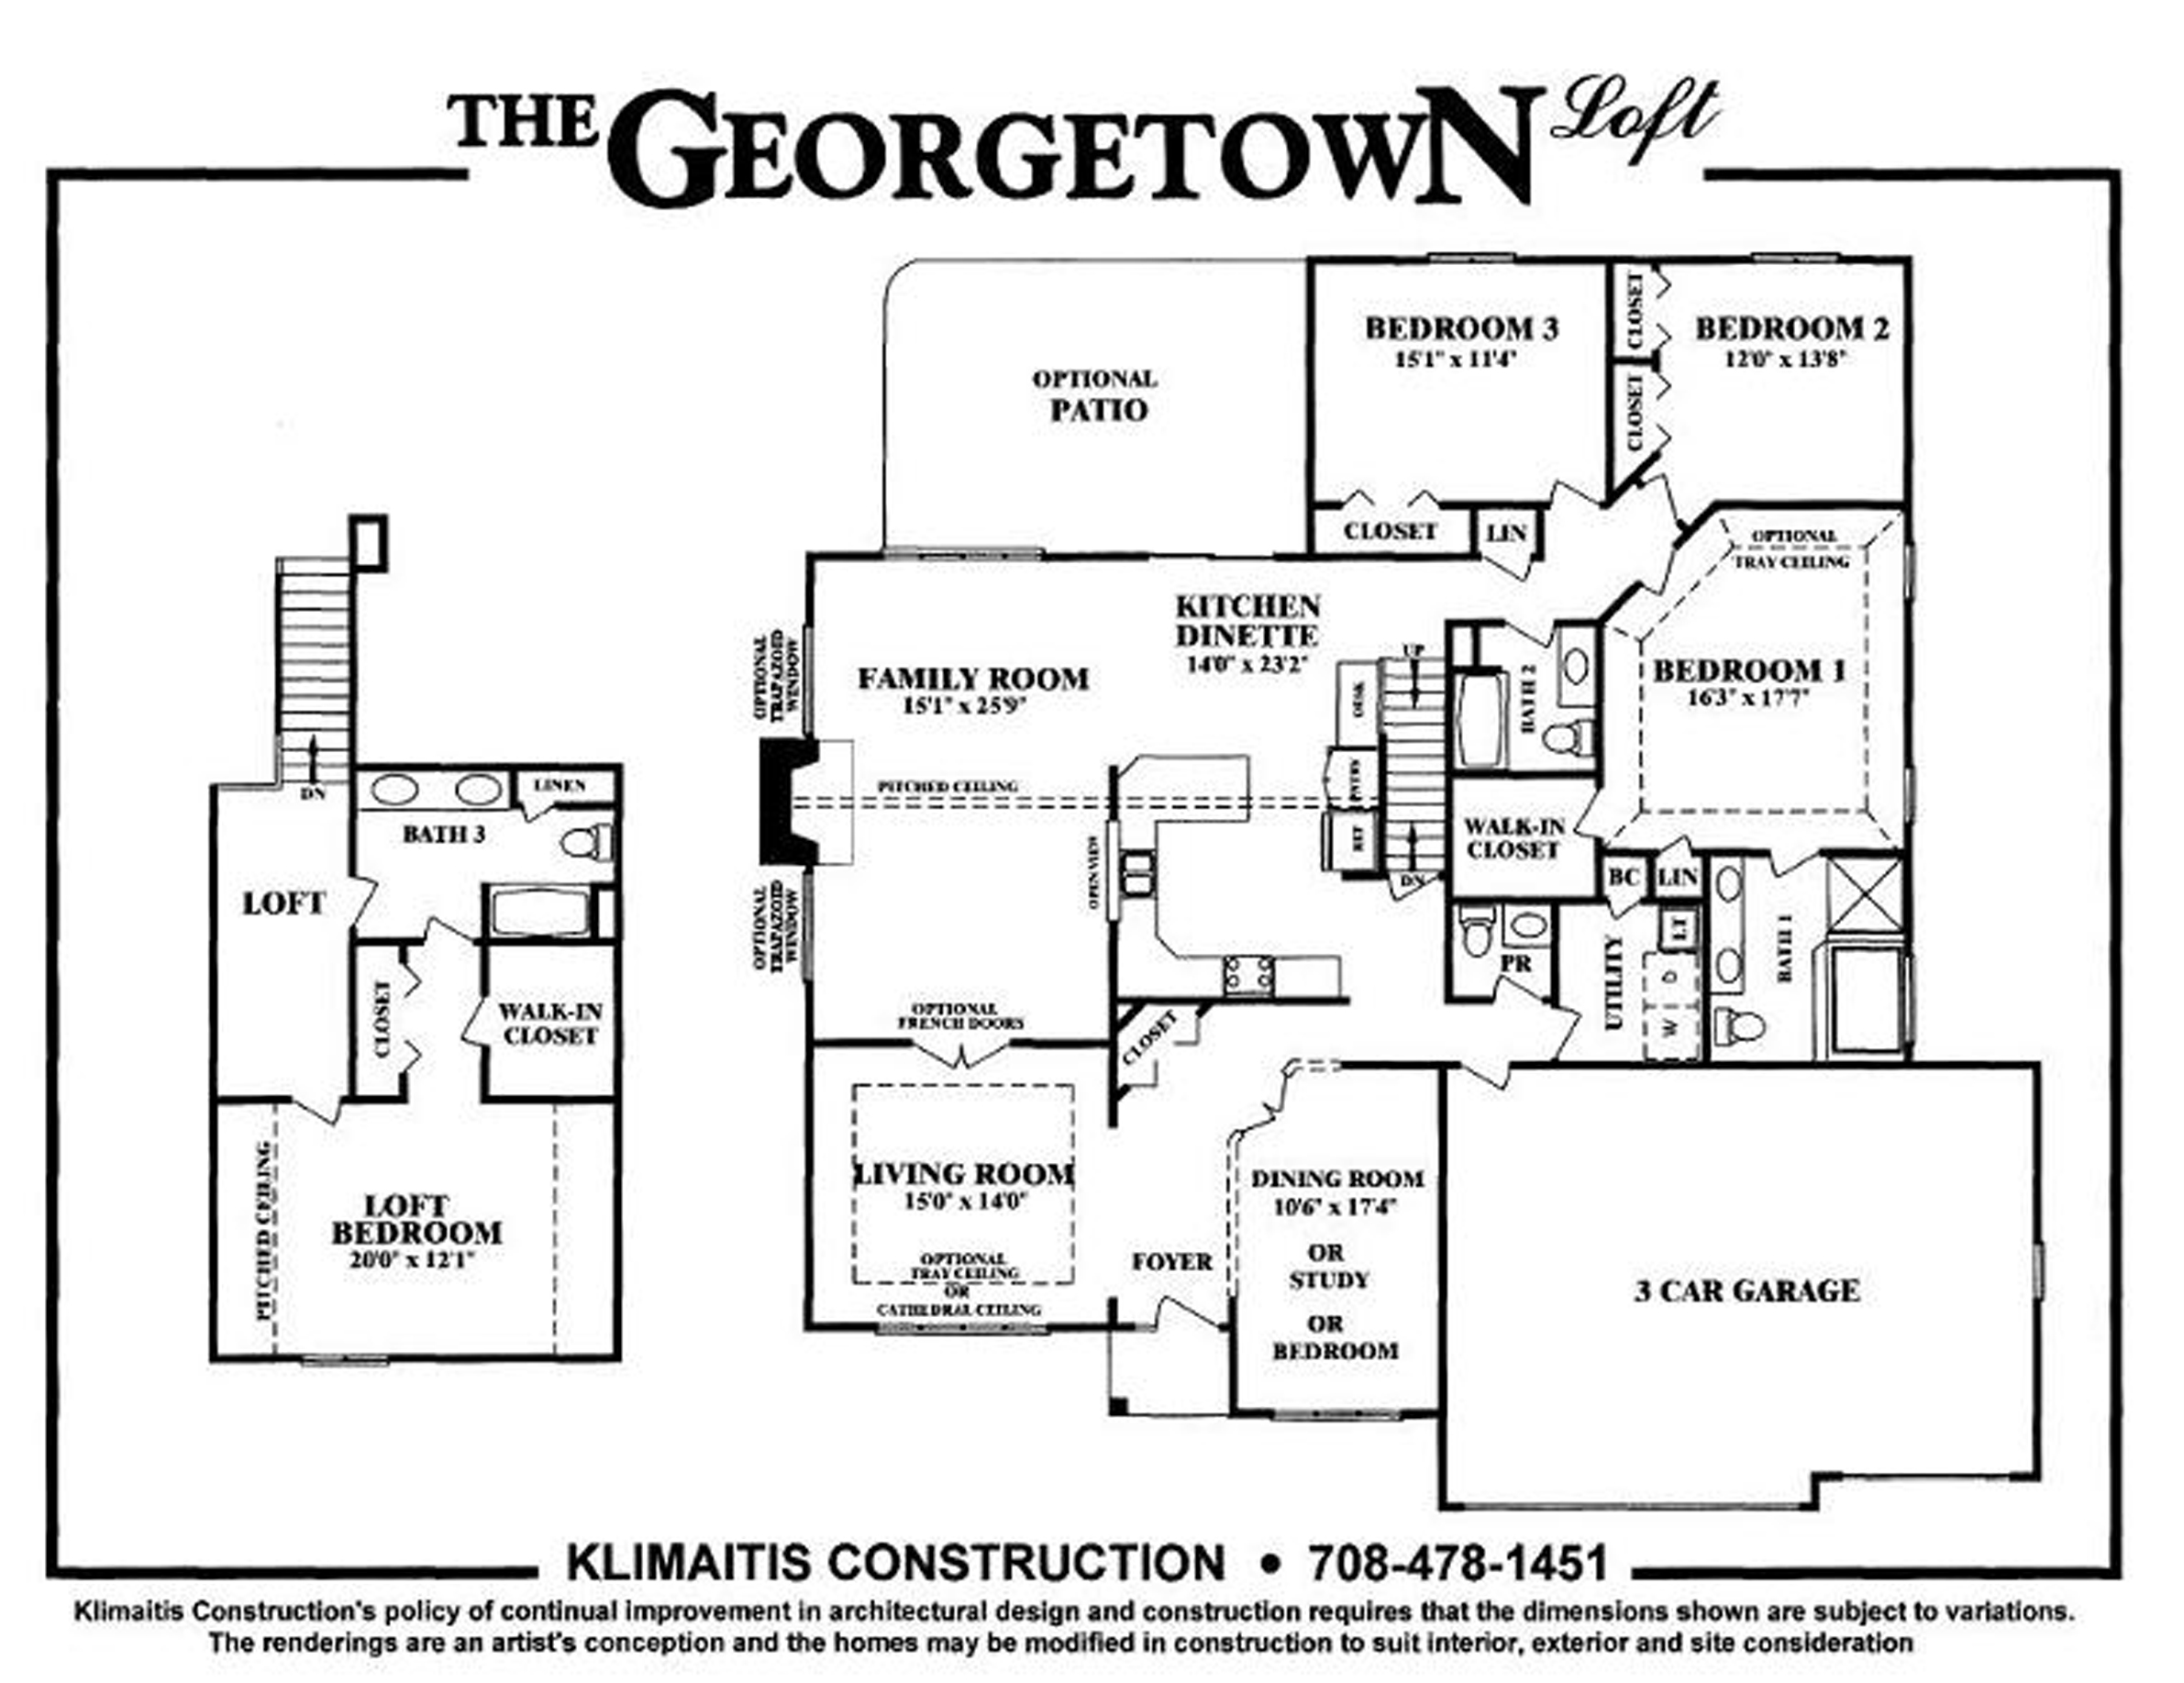 The Georgetown Model - Klimaitis Builders - Kci